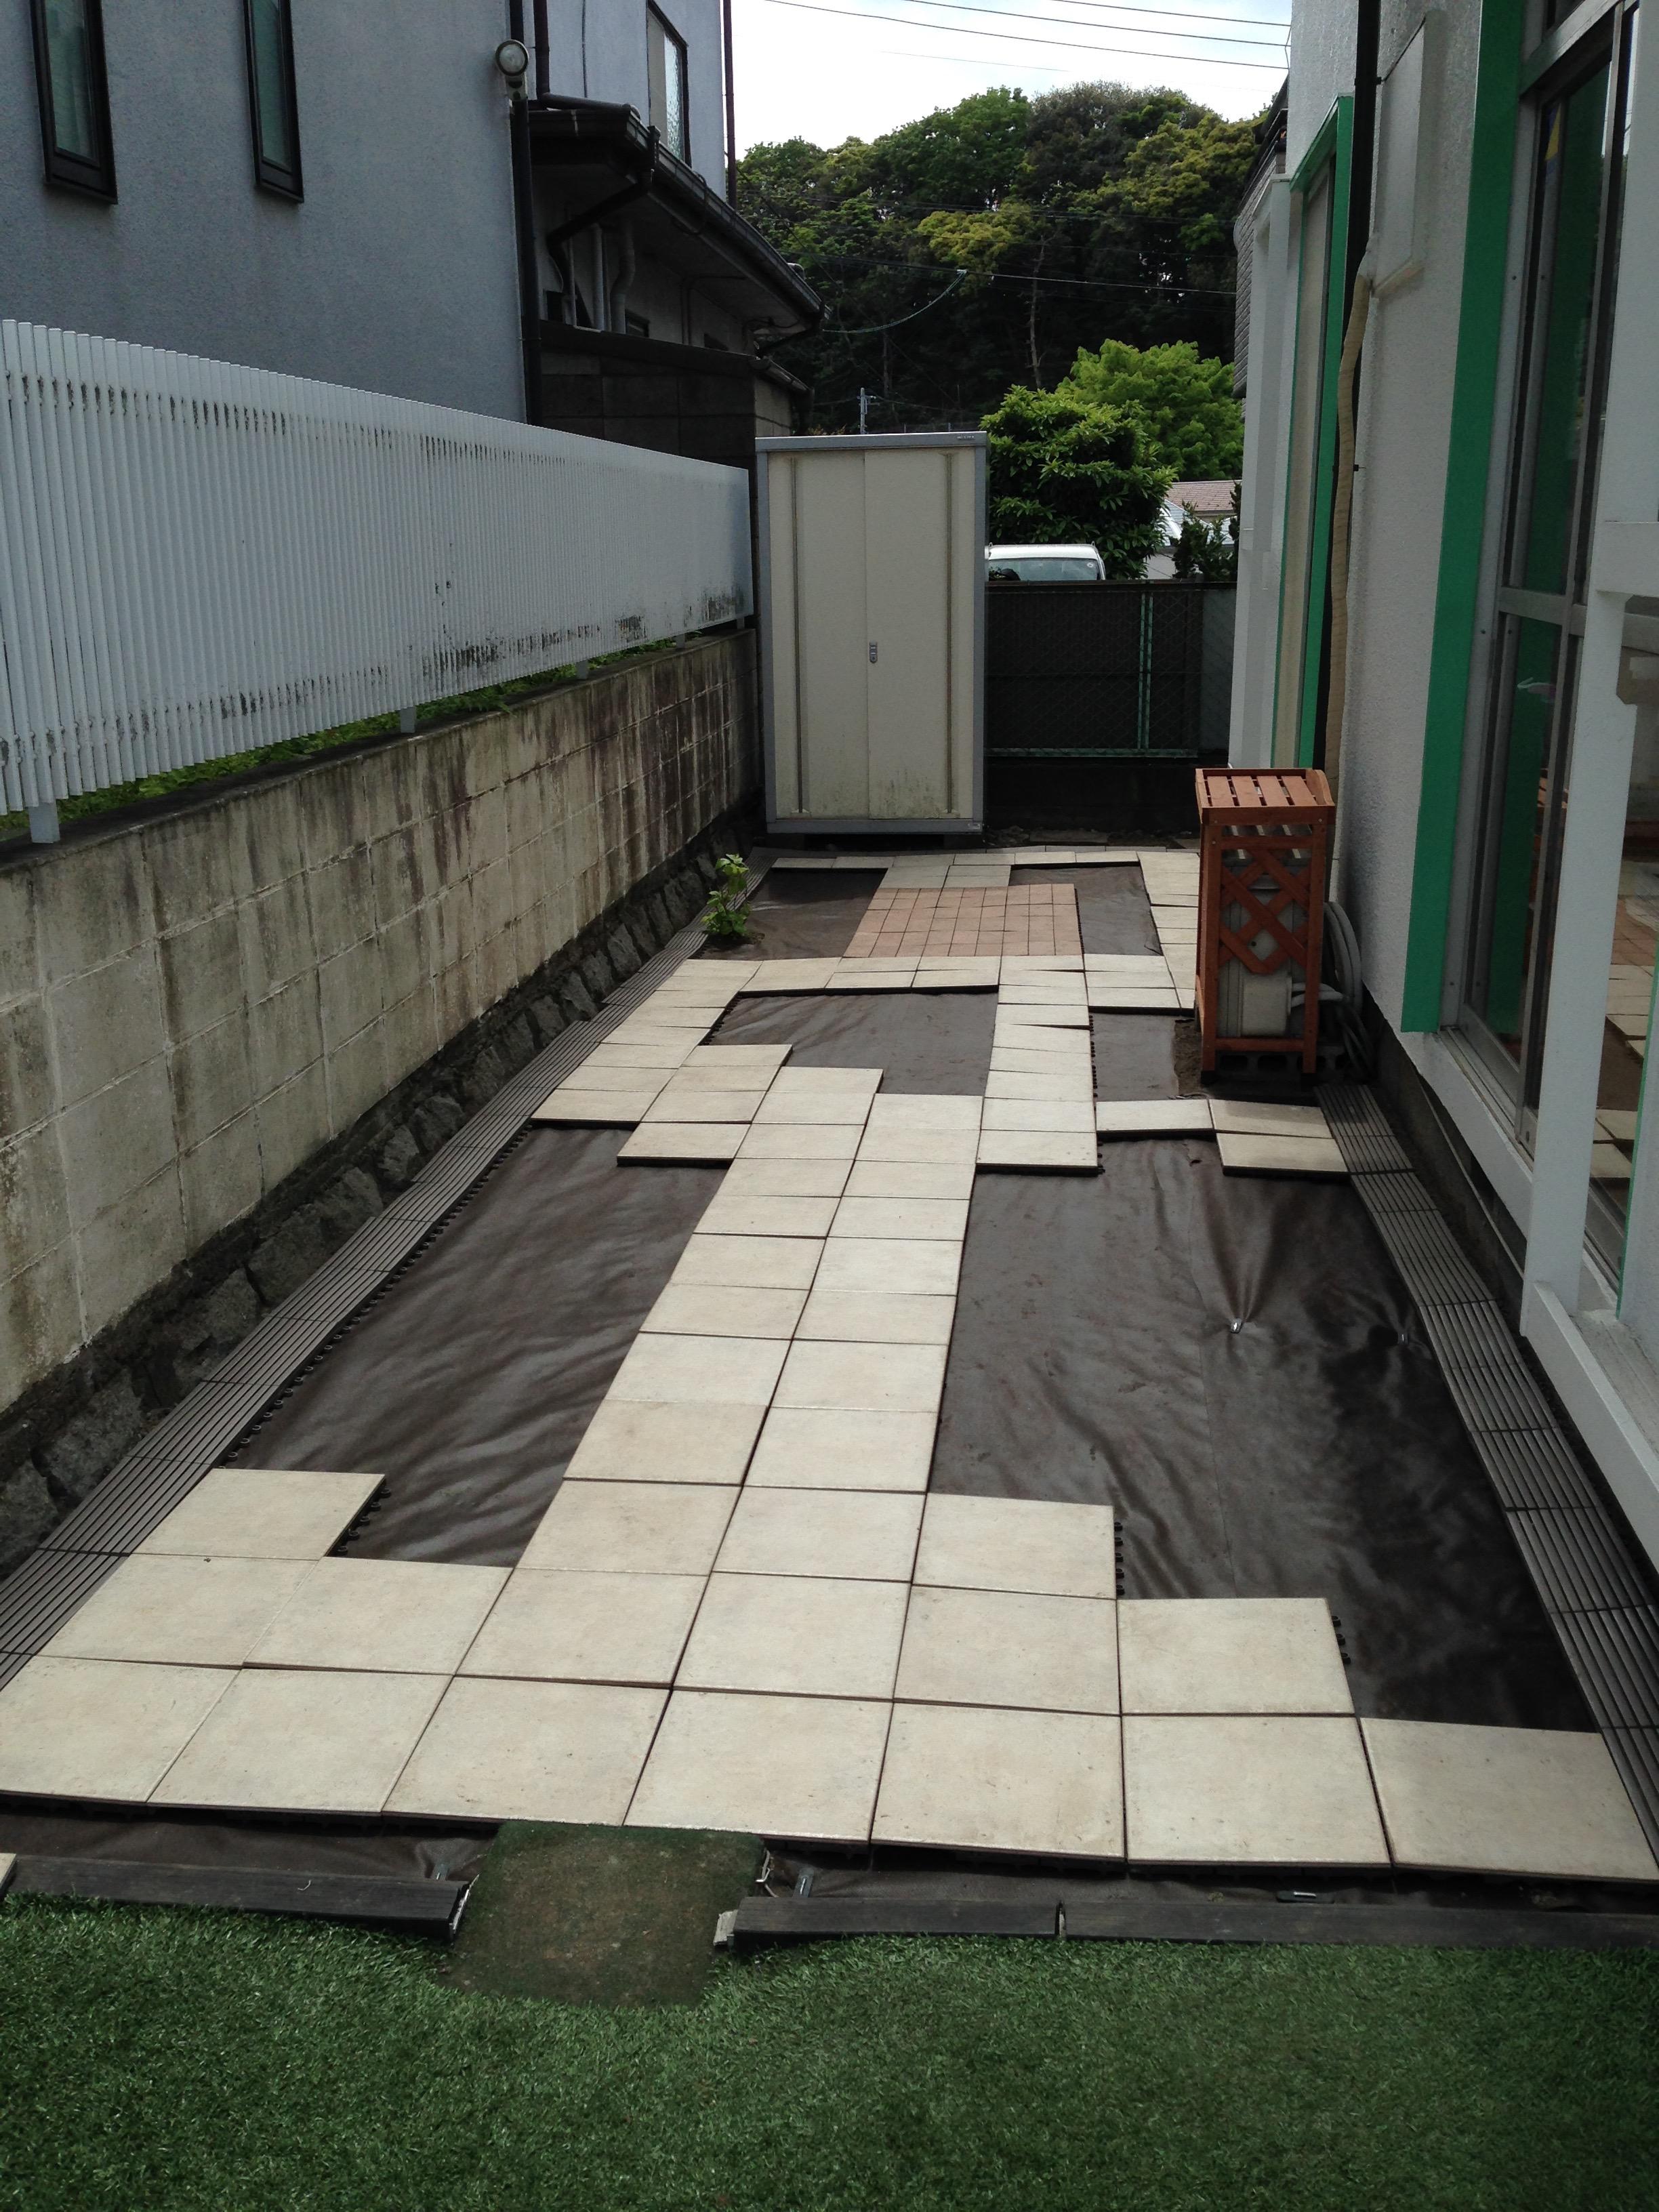 Laying down Tile